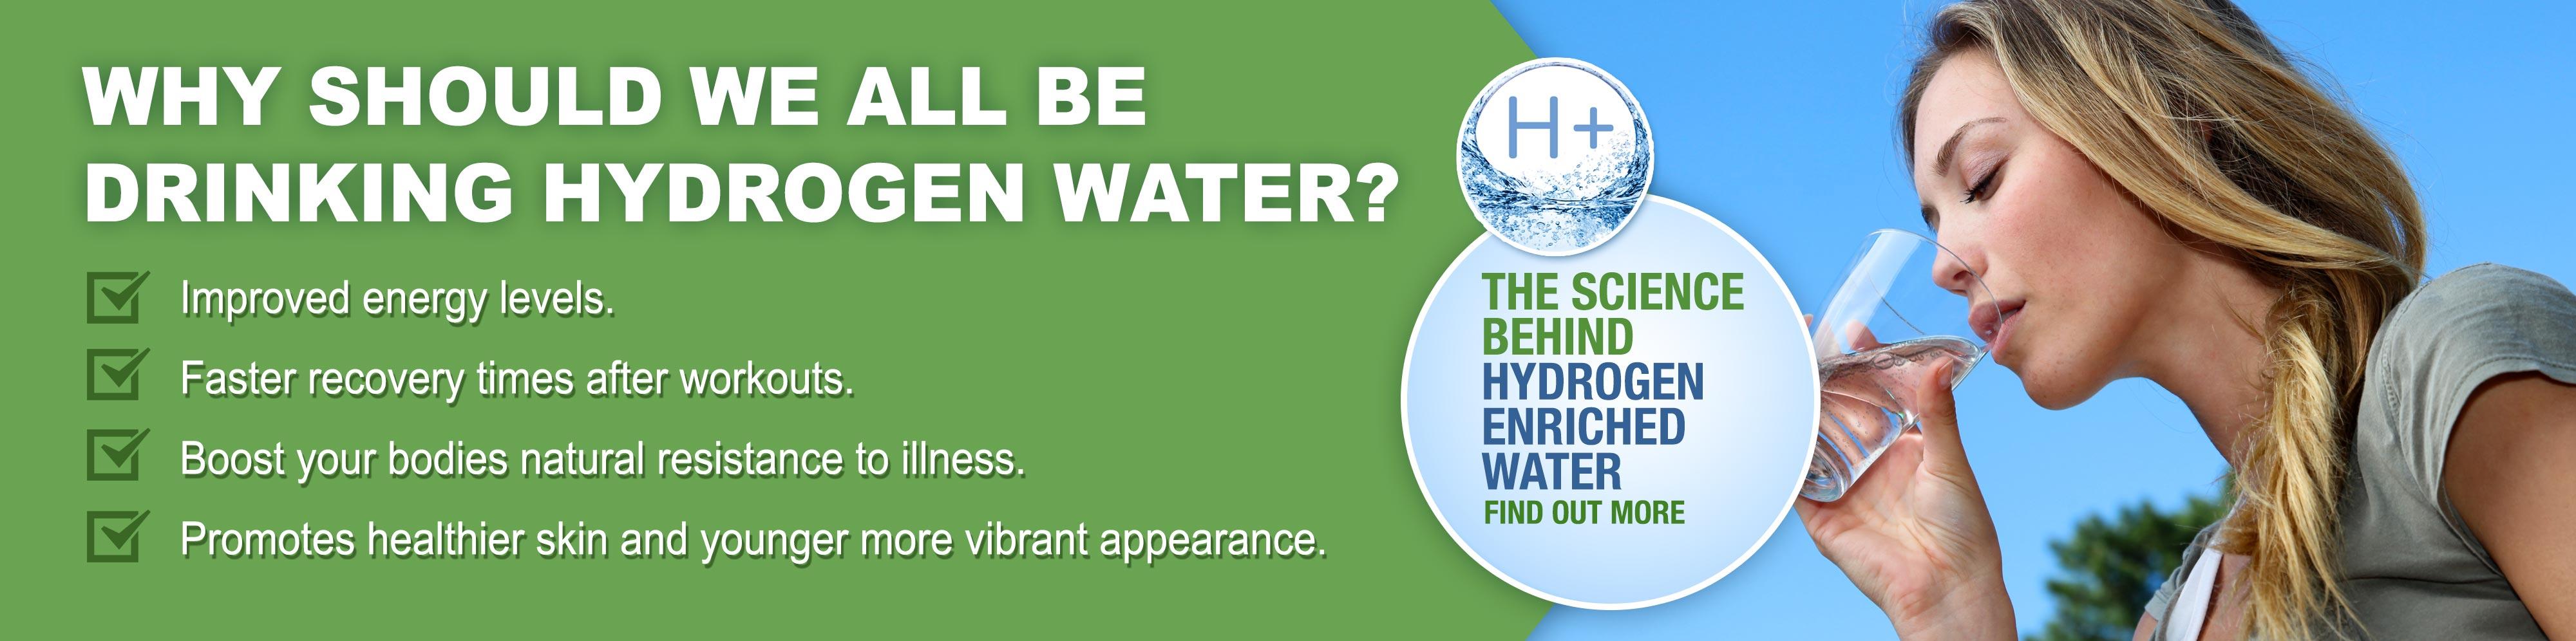 why drink hydrogen water